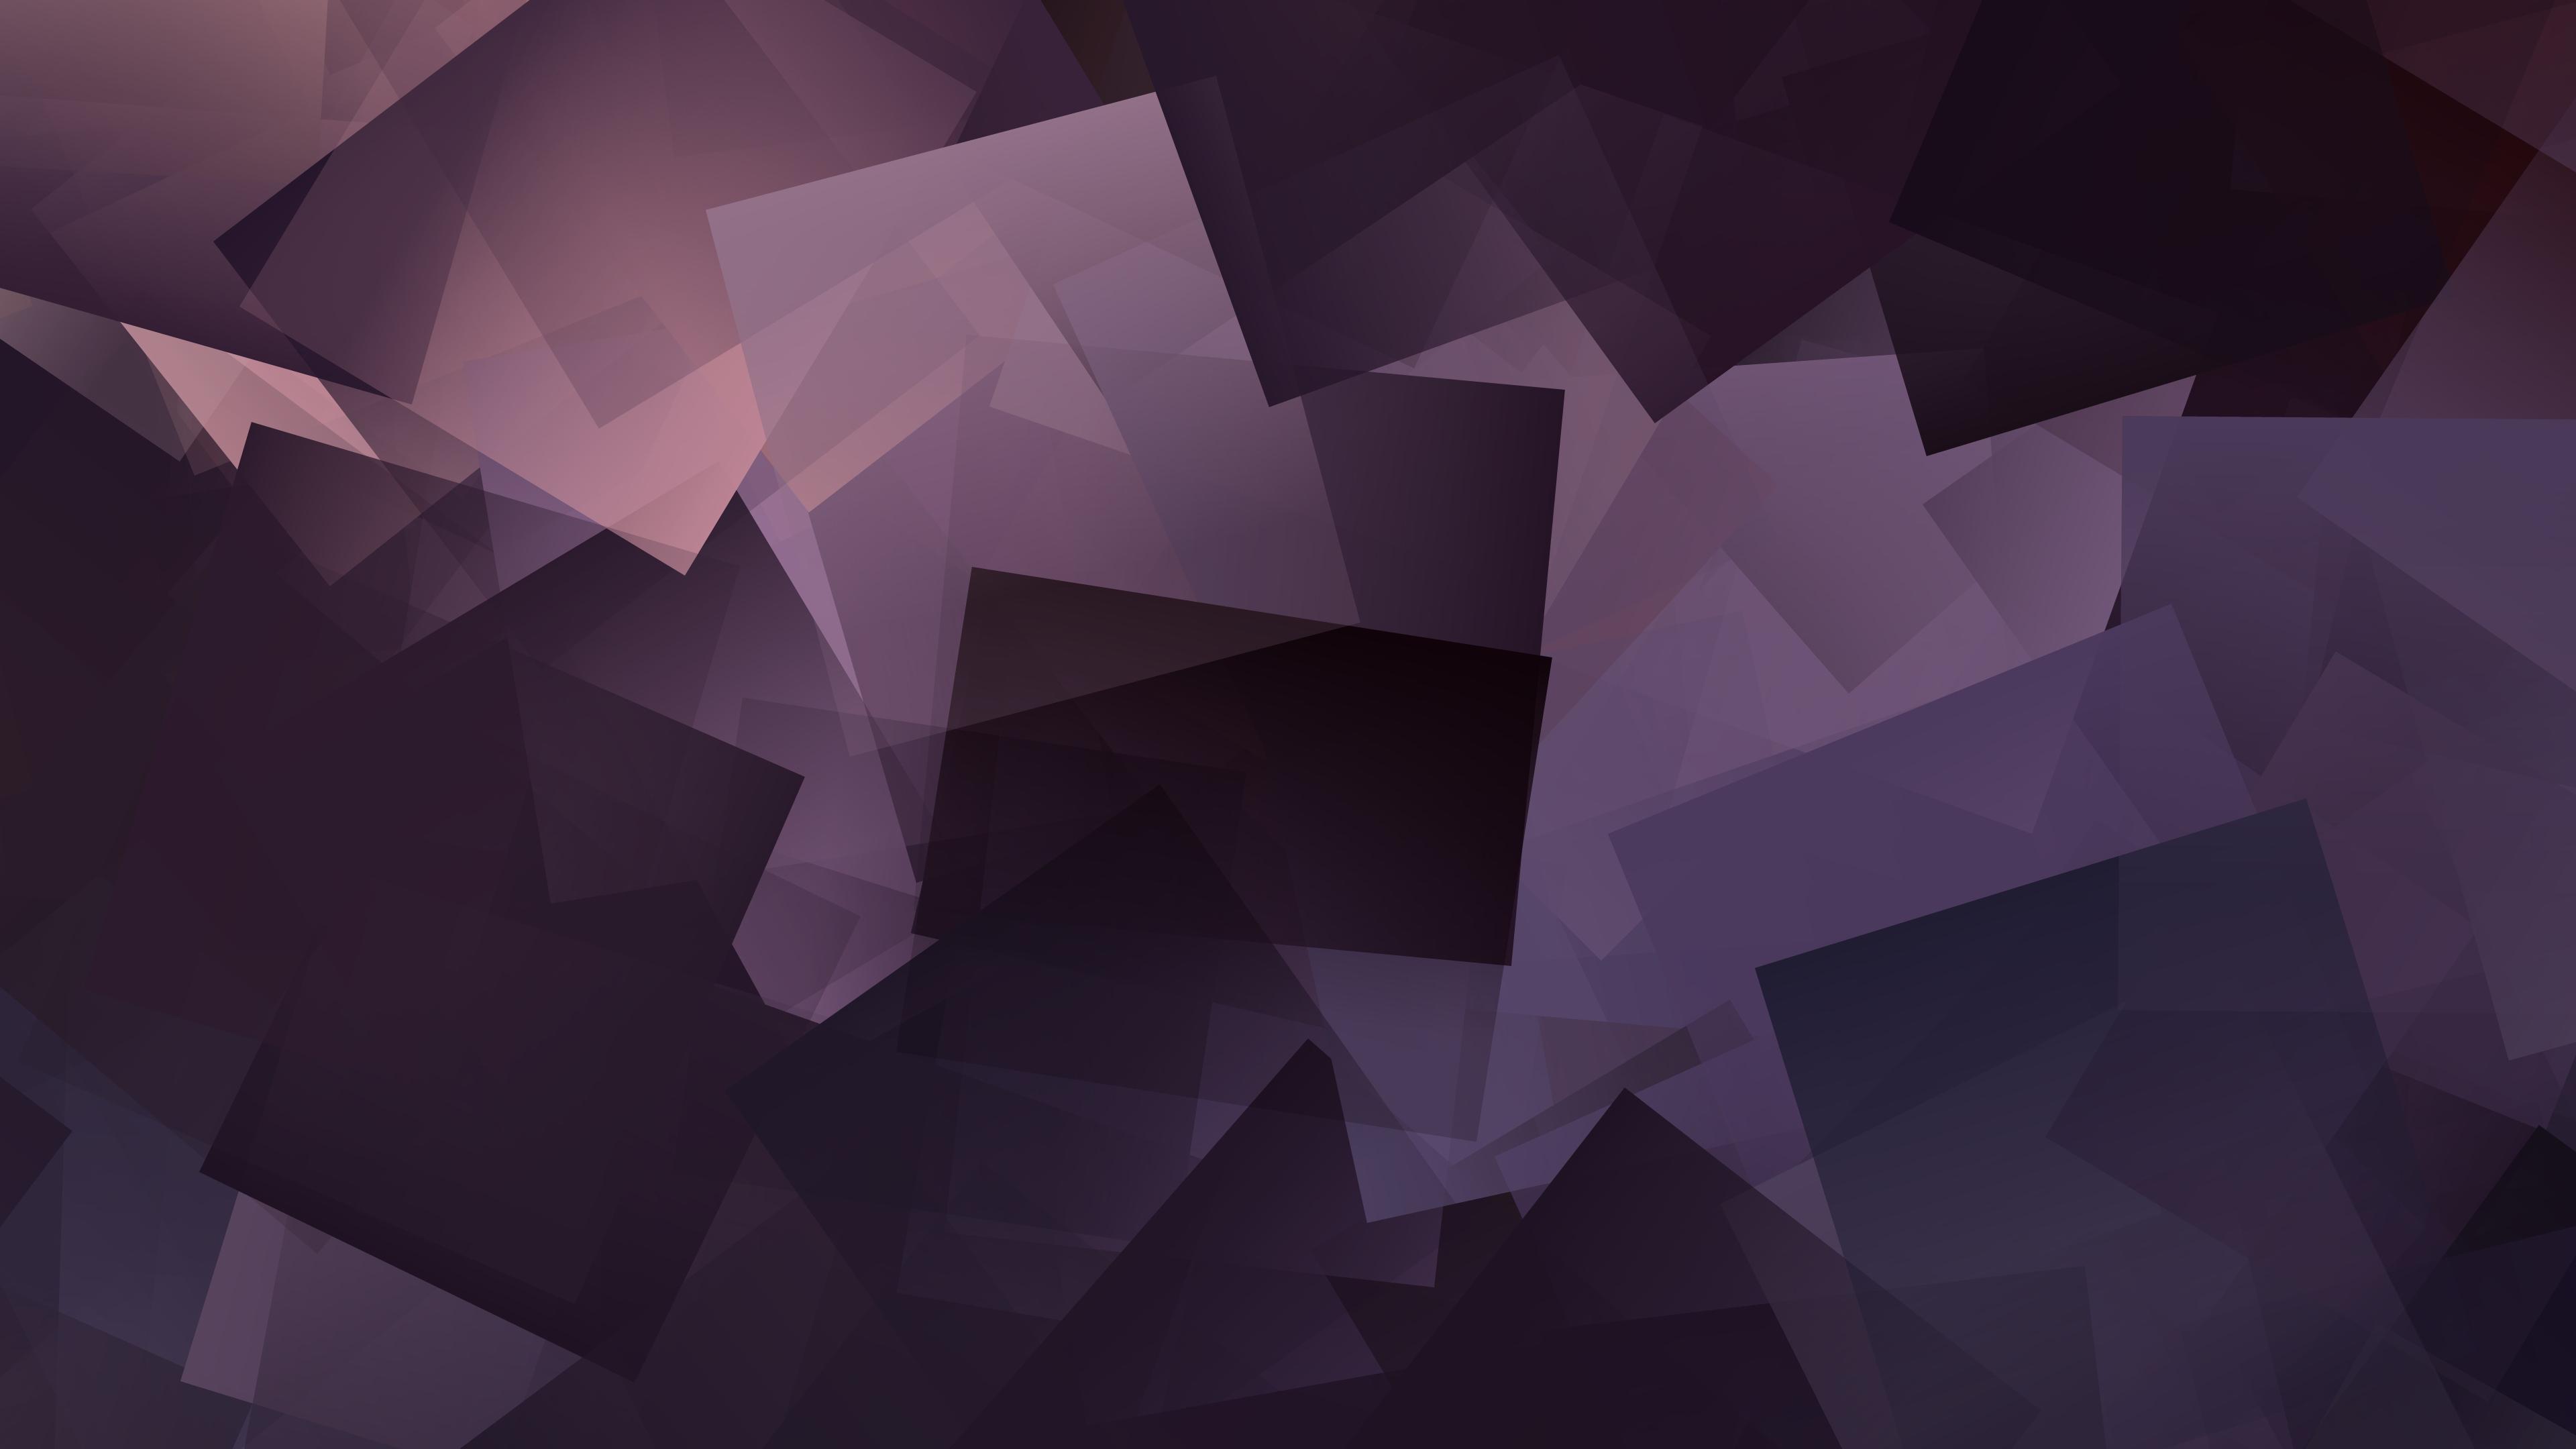 gradient geometry background abstract 1539370999 - Gradient Geometry Background Abstract - shapes wallpapers, hd-wallpapers, gradient wallpapers, geometry wallpapers, cube wallpapers, abstract wallpapers, 4k-wallpapers